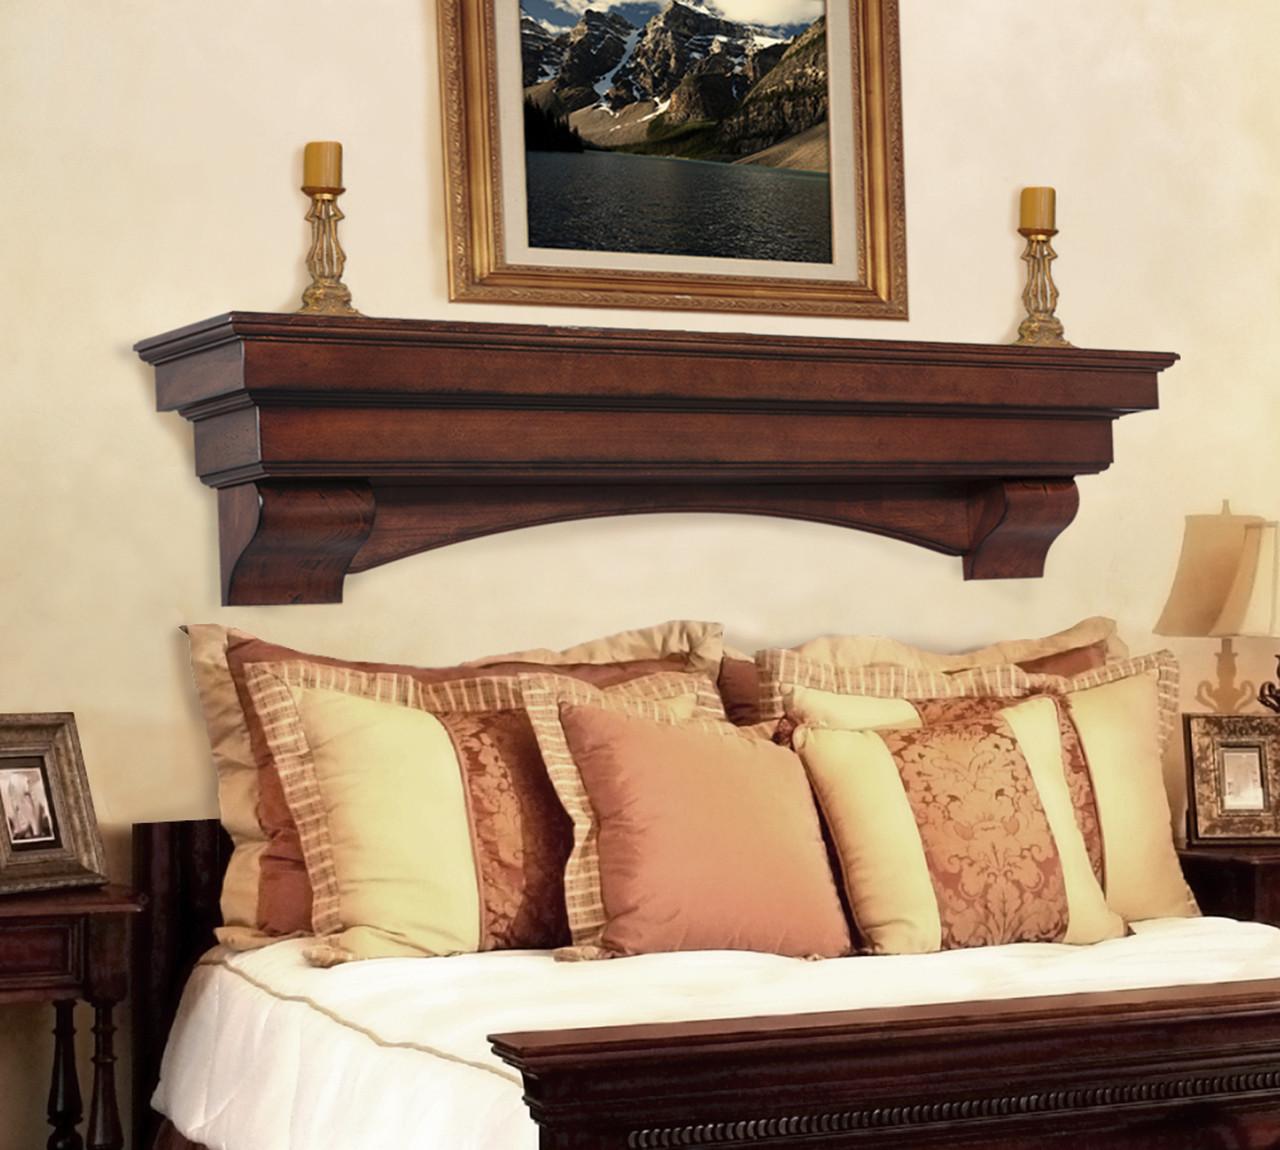 The Auburn 495 Fireplace Mantel Shelf, Life Style View 1